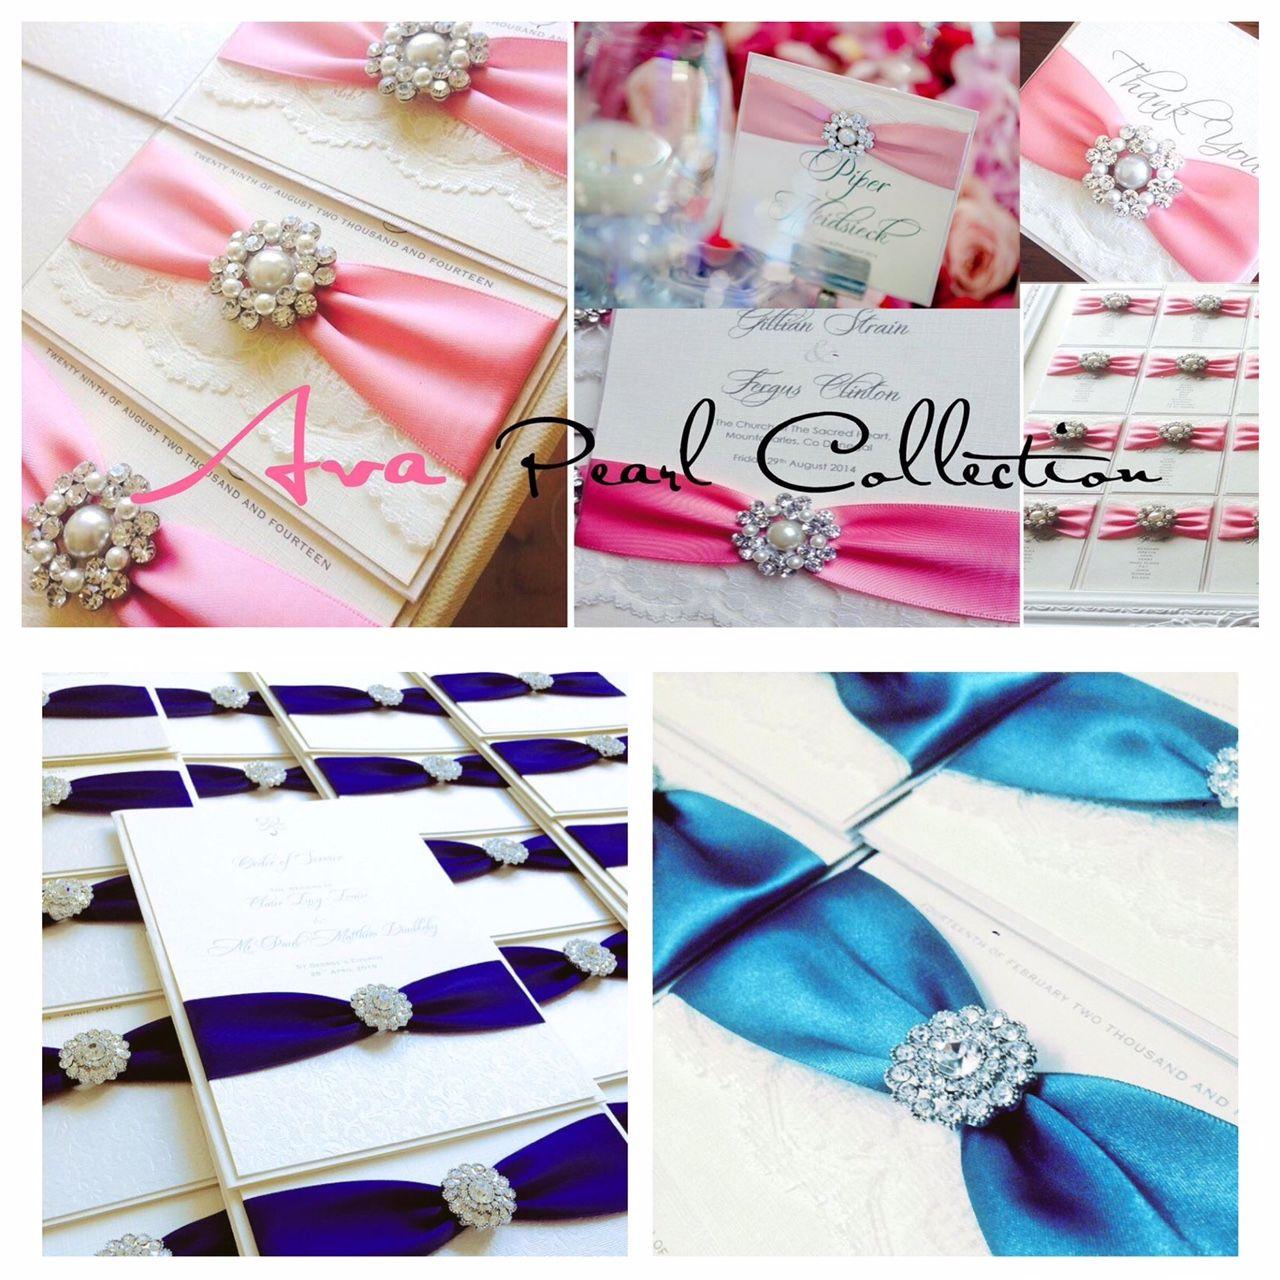 Wedding ceremony and reception keepsake stationery